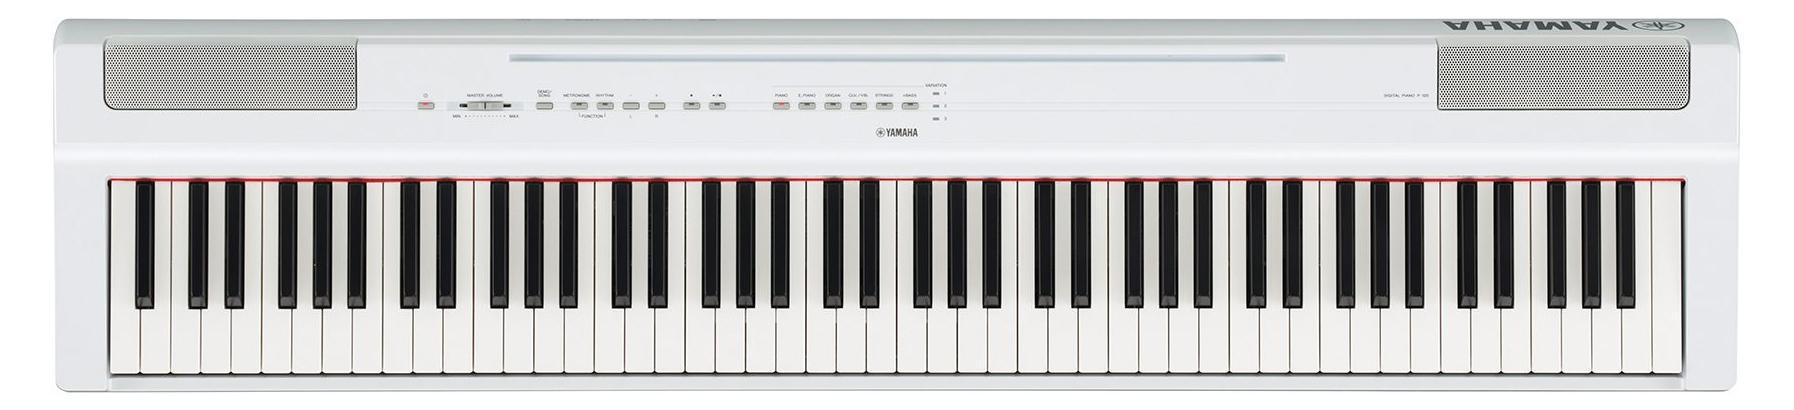 Stagepianos - Yamaha P 125WH Stage Piano Weiß - Onlineshop Musikhaus Kirstein